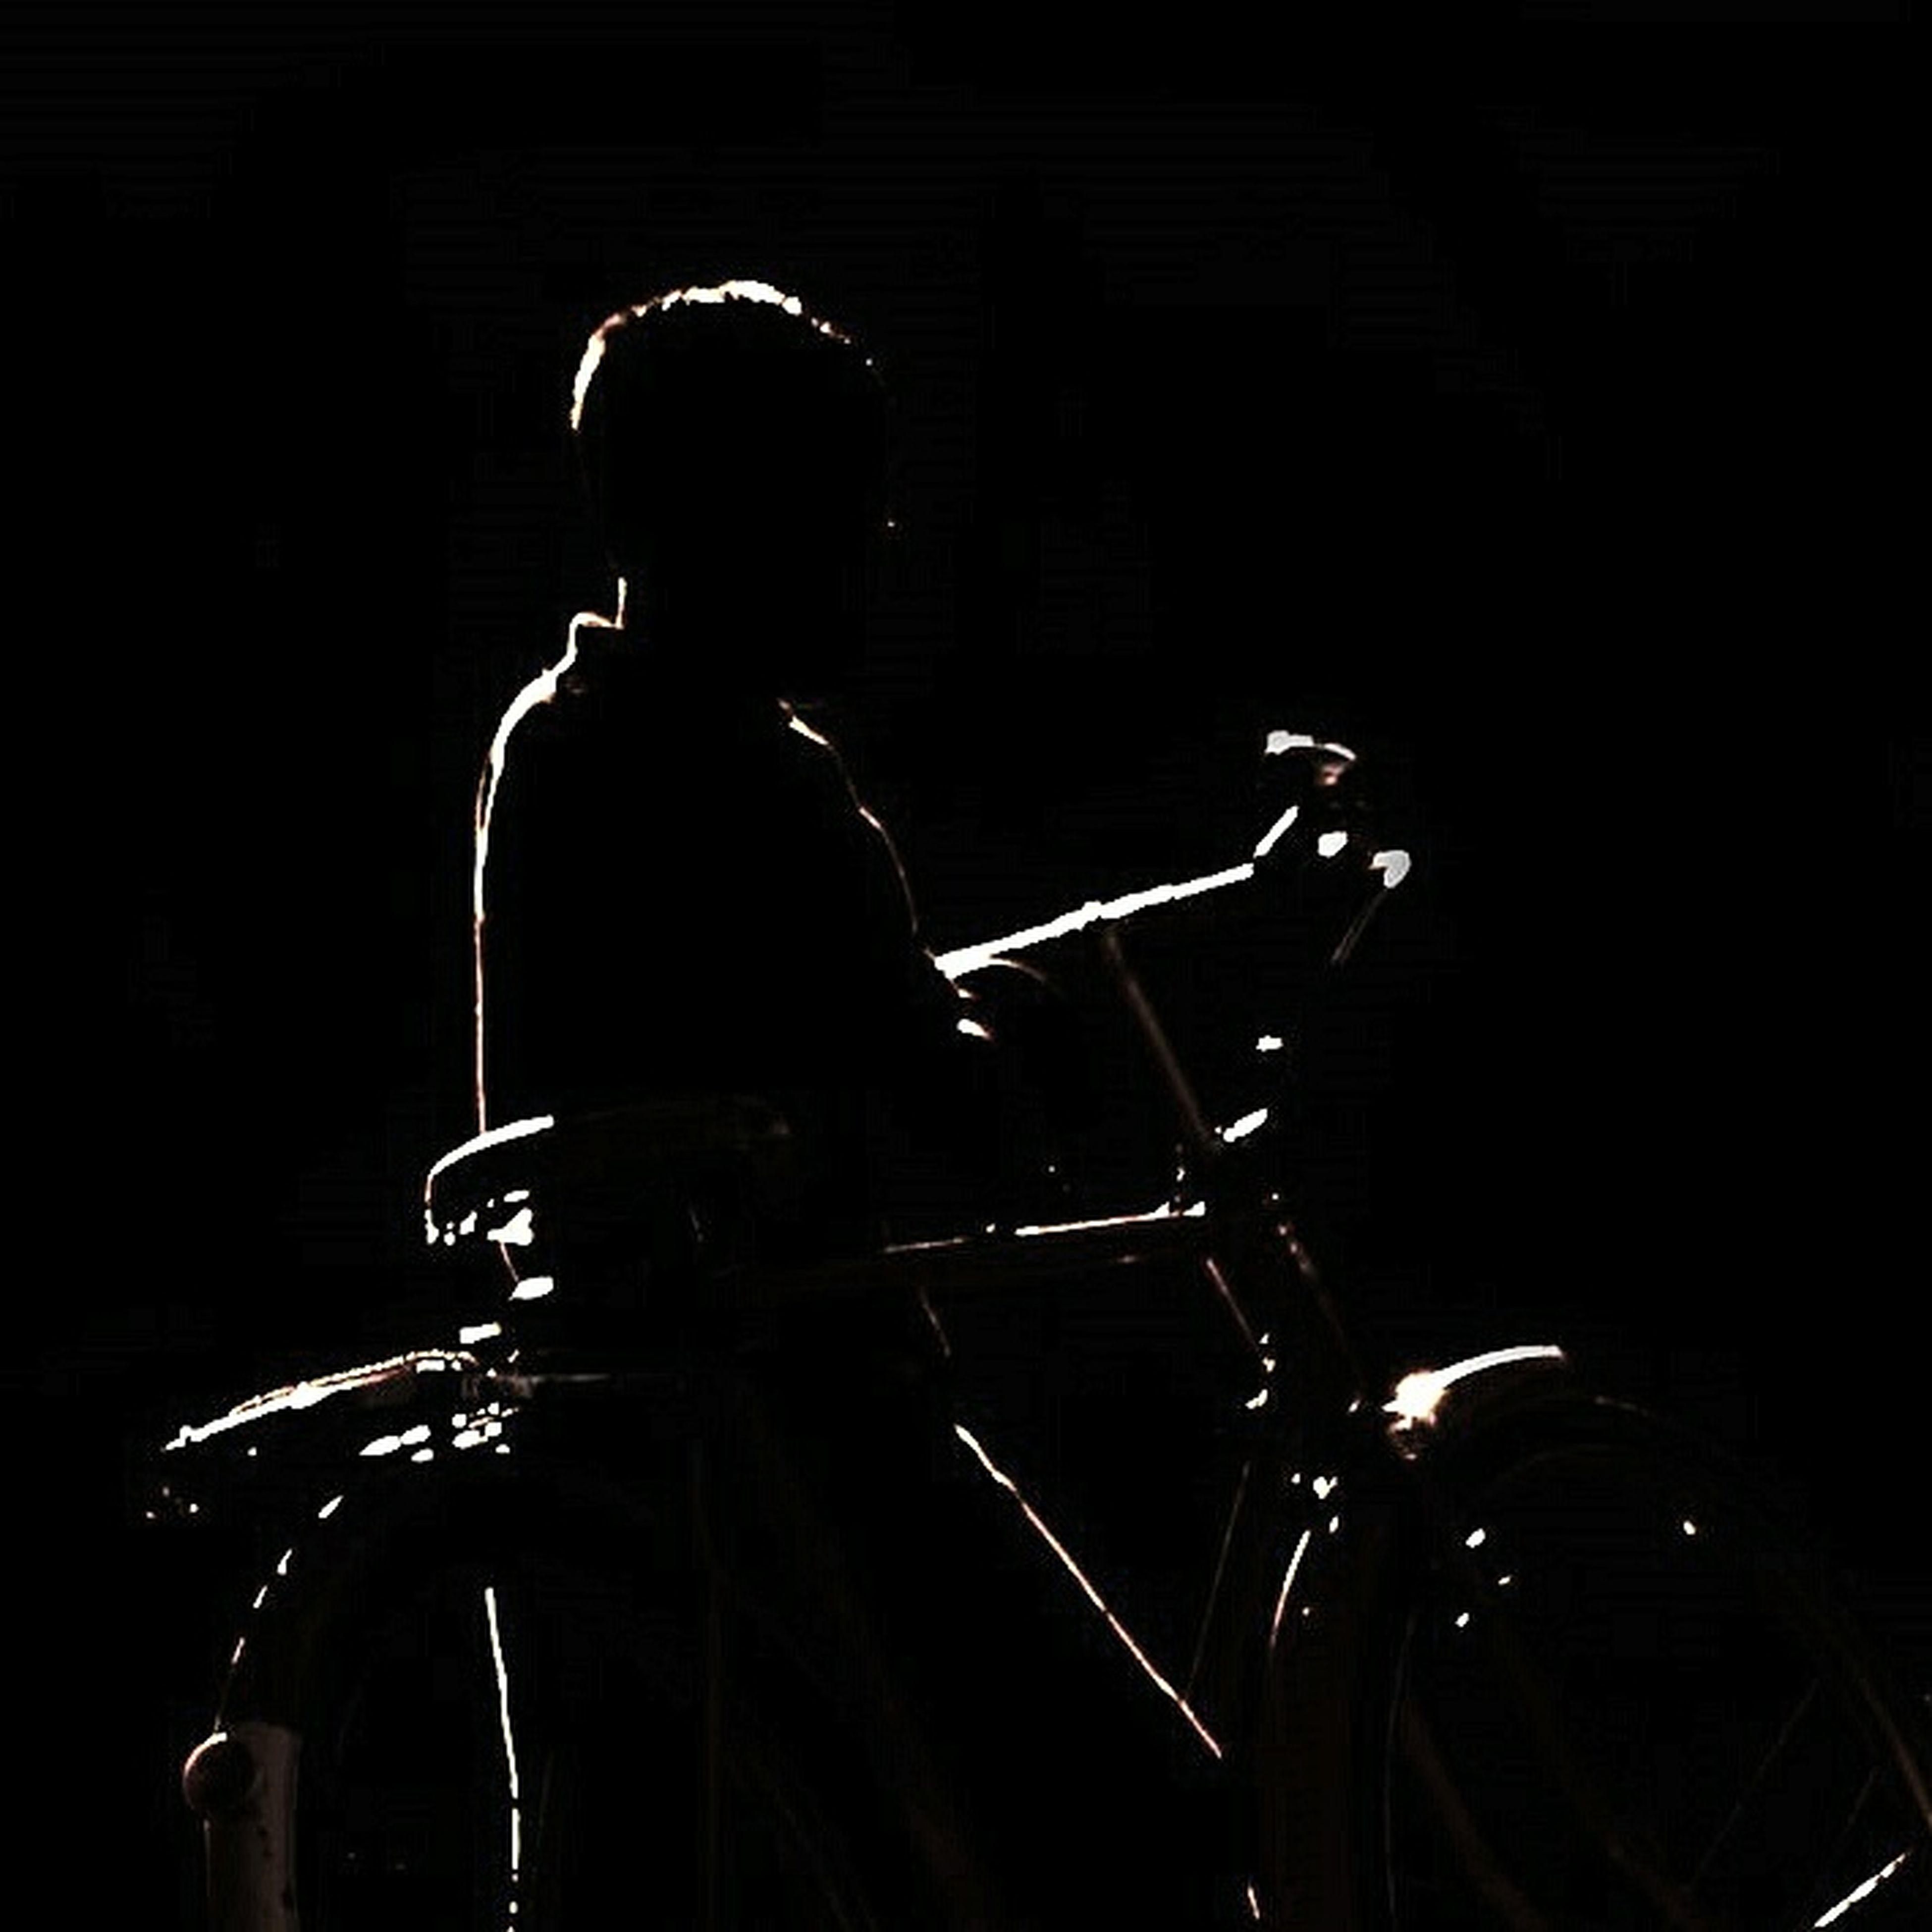 lifestyles, men, leisure activity, casual clothing, night, dark, illuminated, city life